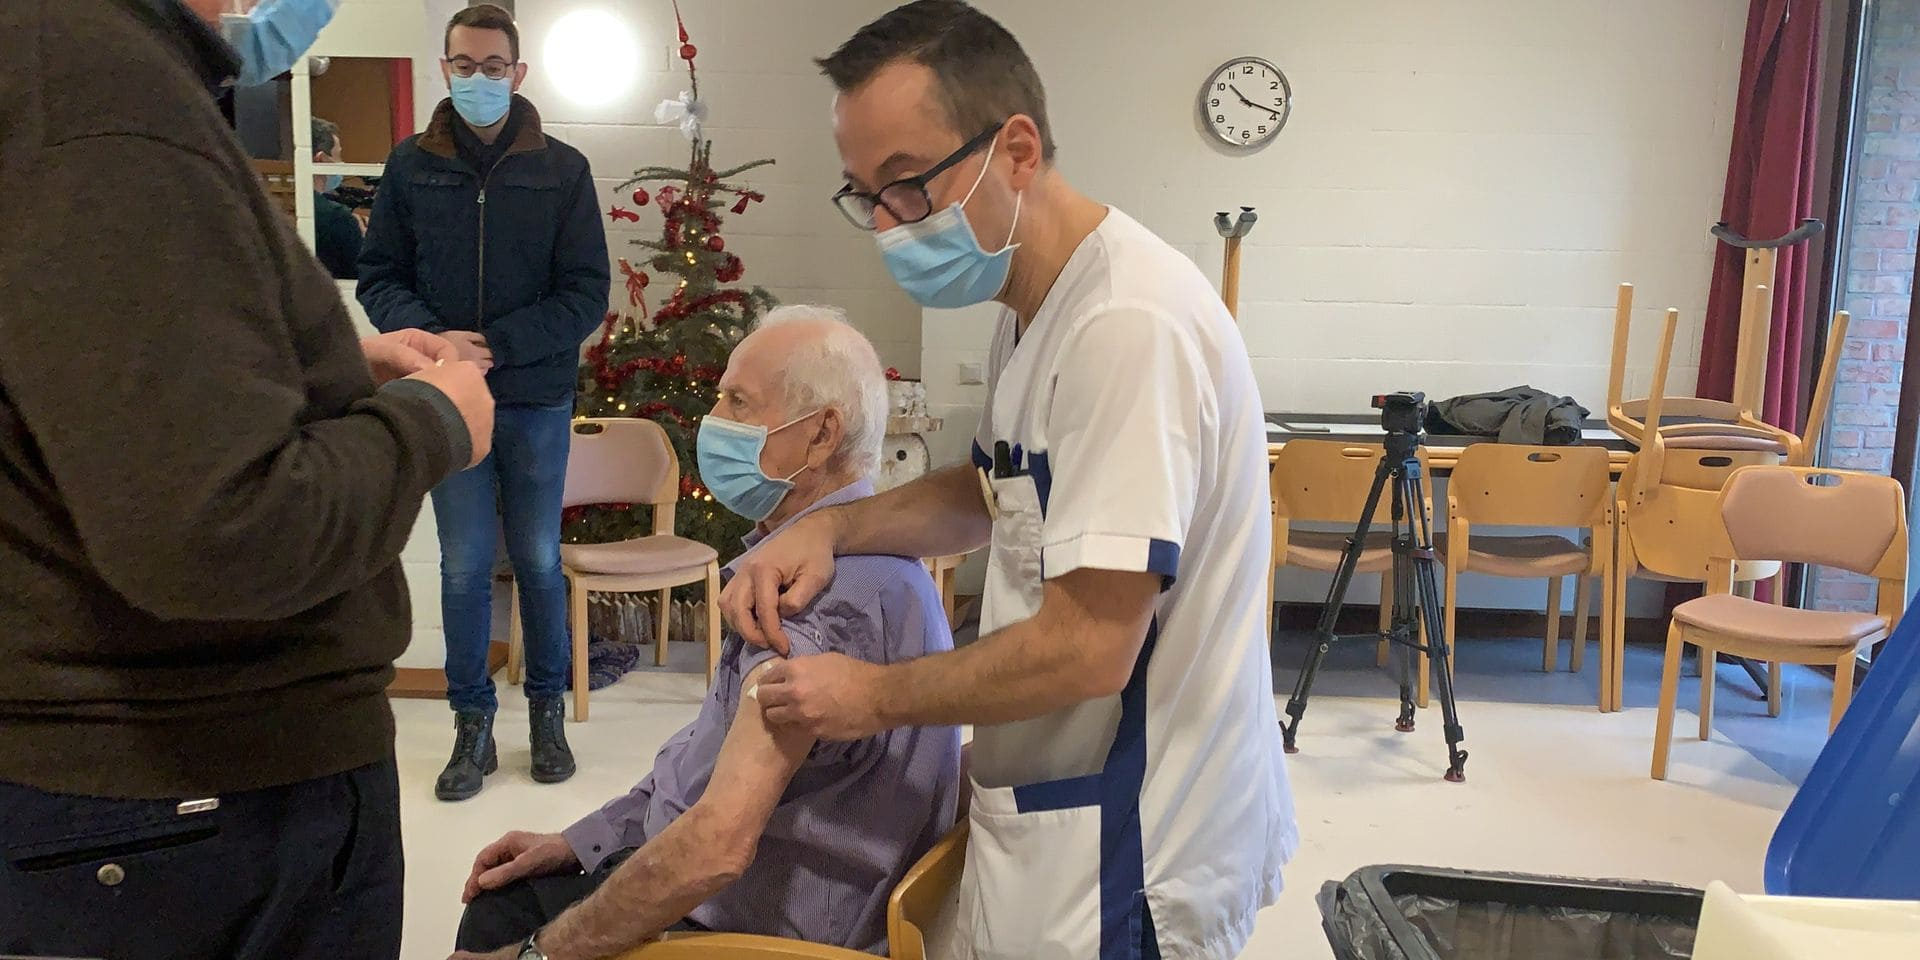 Vingt-quatre résidents des Tayons à Nivelles testés positifs